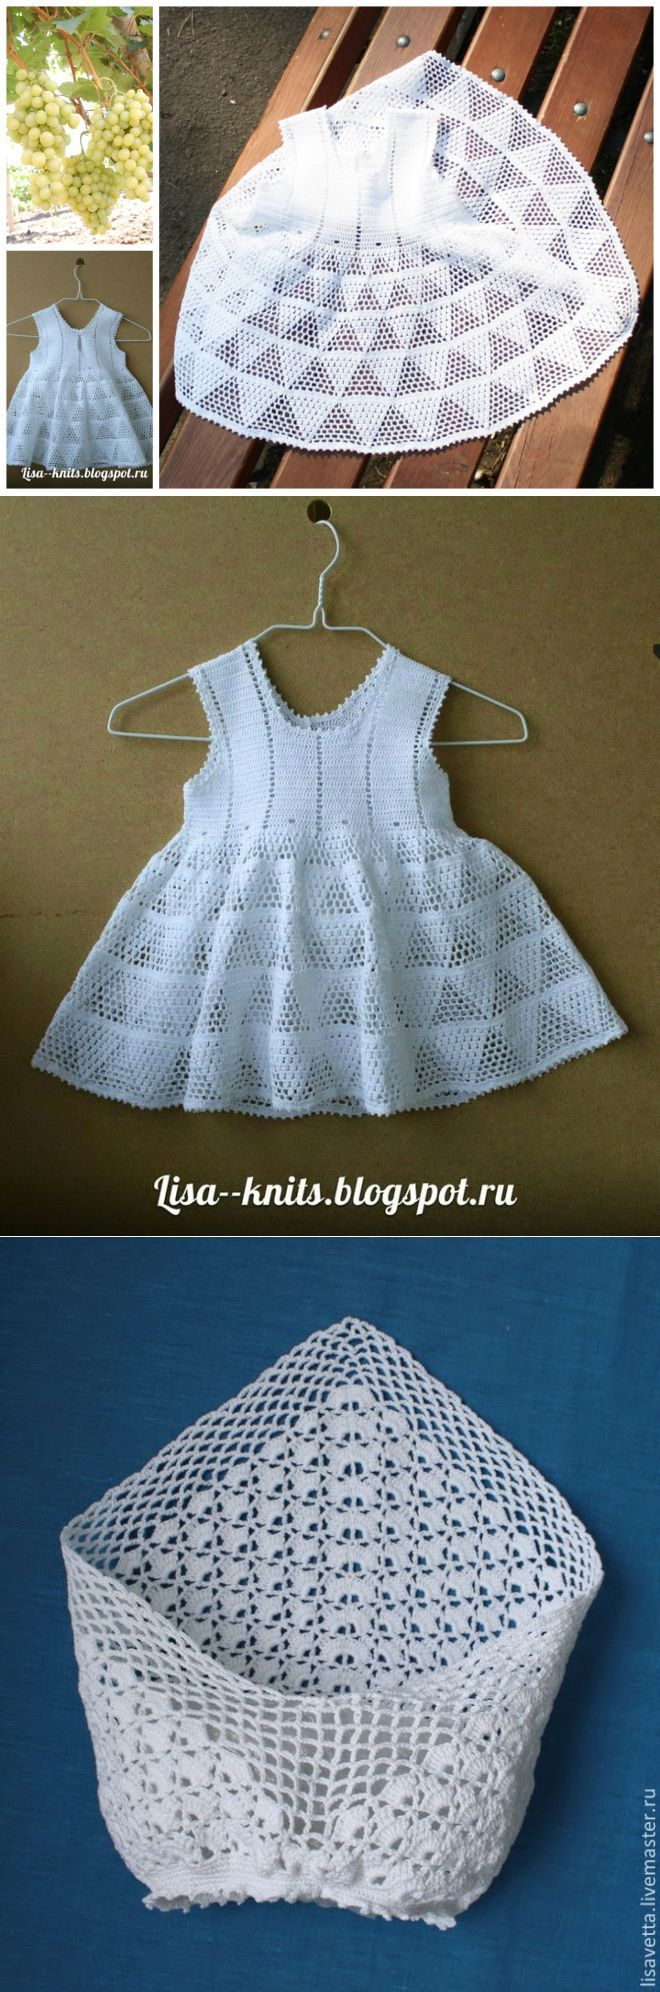 lisa--knits.blogspot.ru